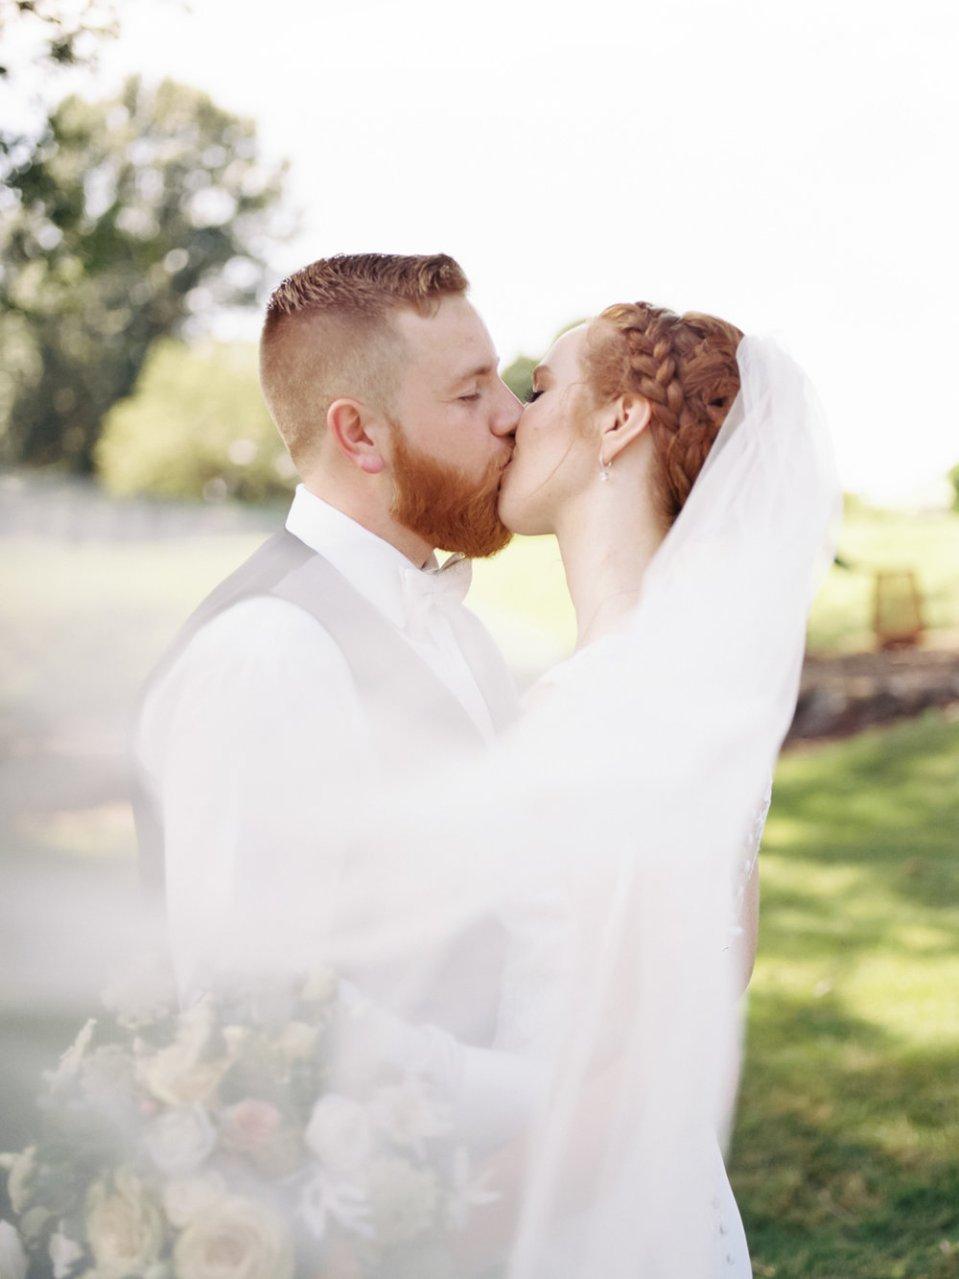 Romantic Summer Wedding in Ashland Ohio-28.jpg